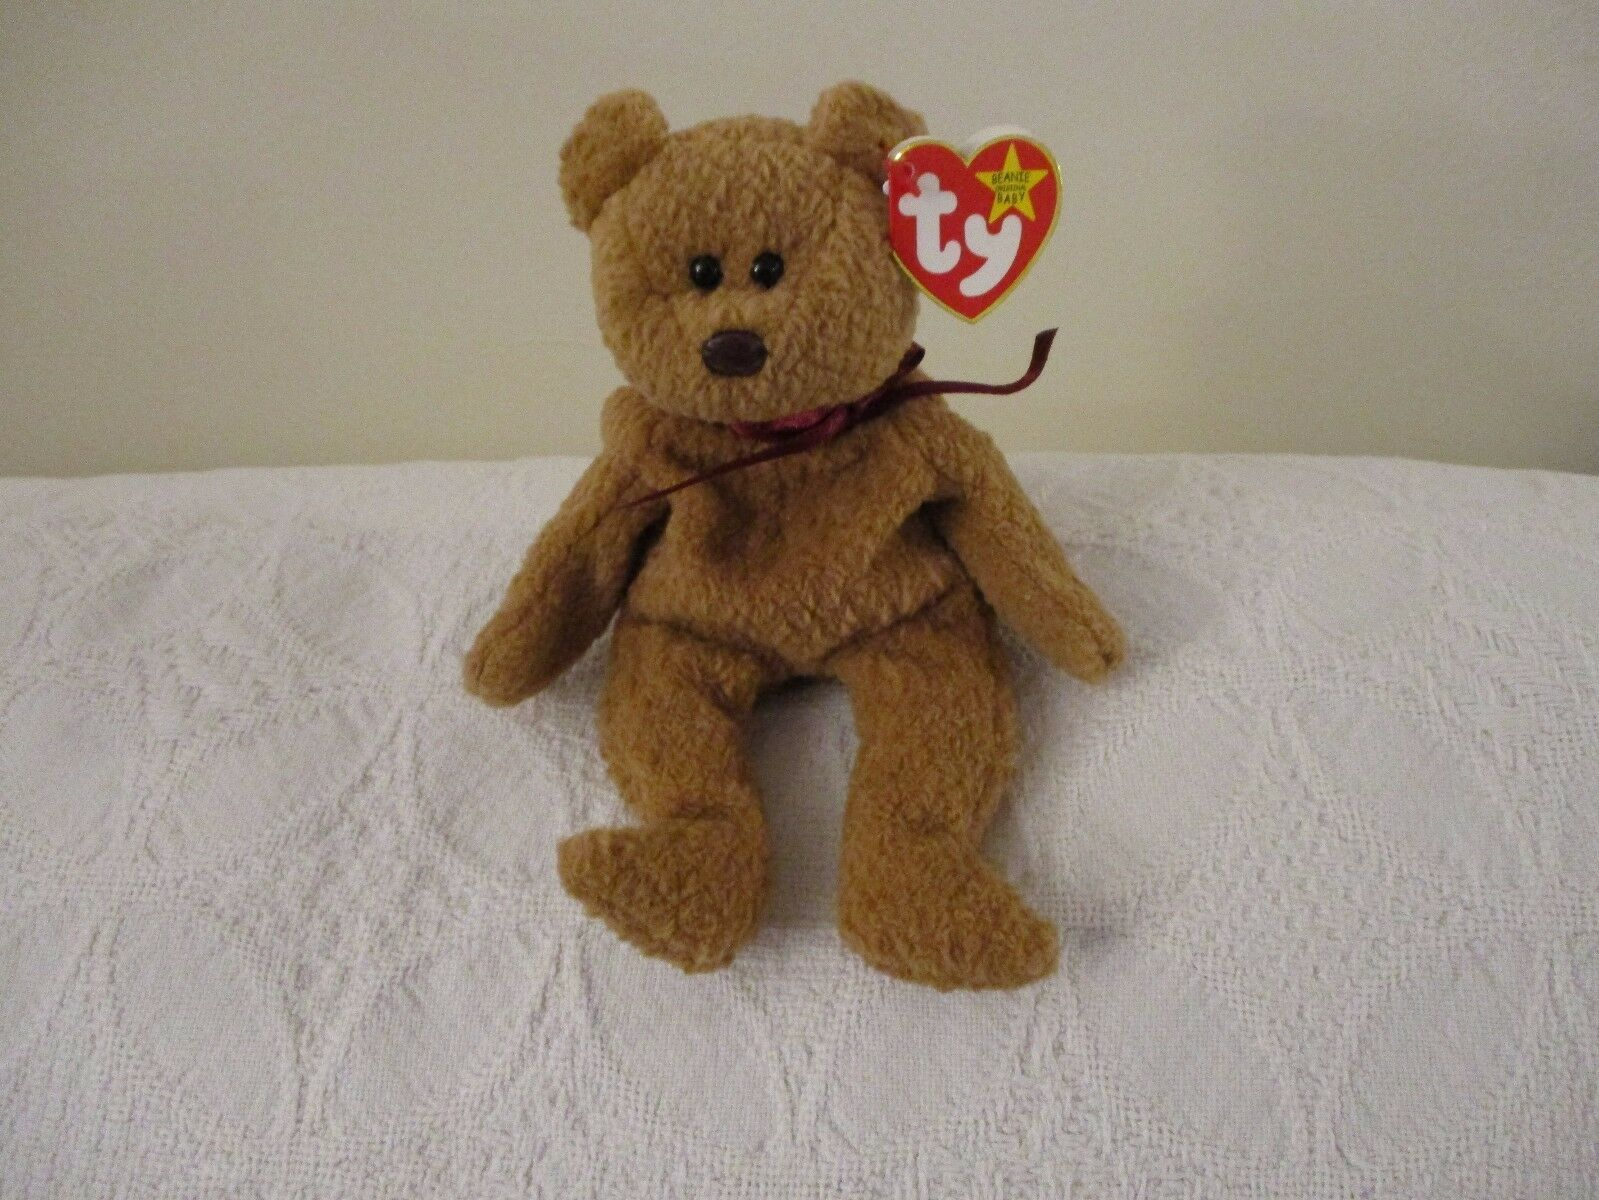 b49c69d3098 TY Beanie Babies CURLY Brown Teddy Bear